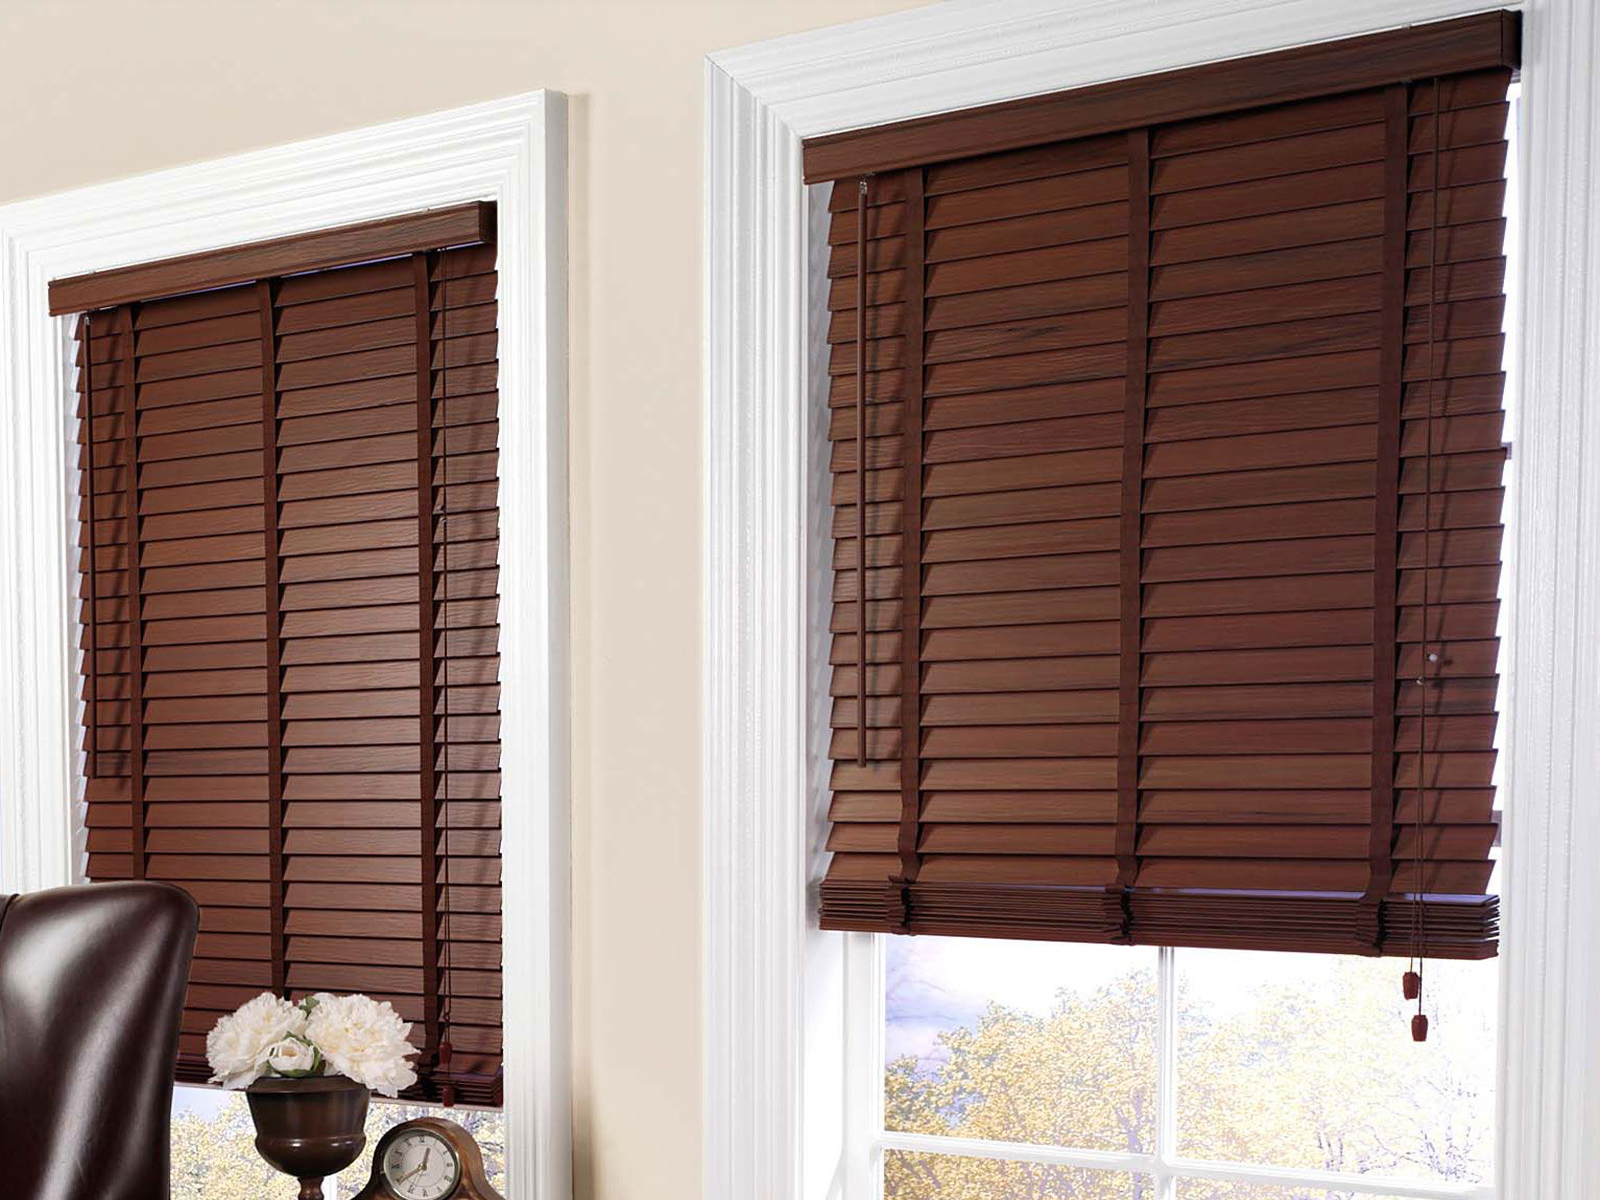 Elige las mejores persianas para decorar tu hogar blog for Estores de madera